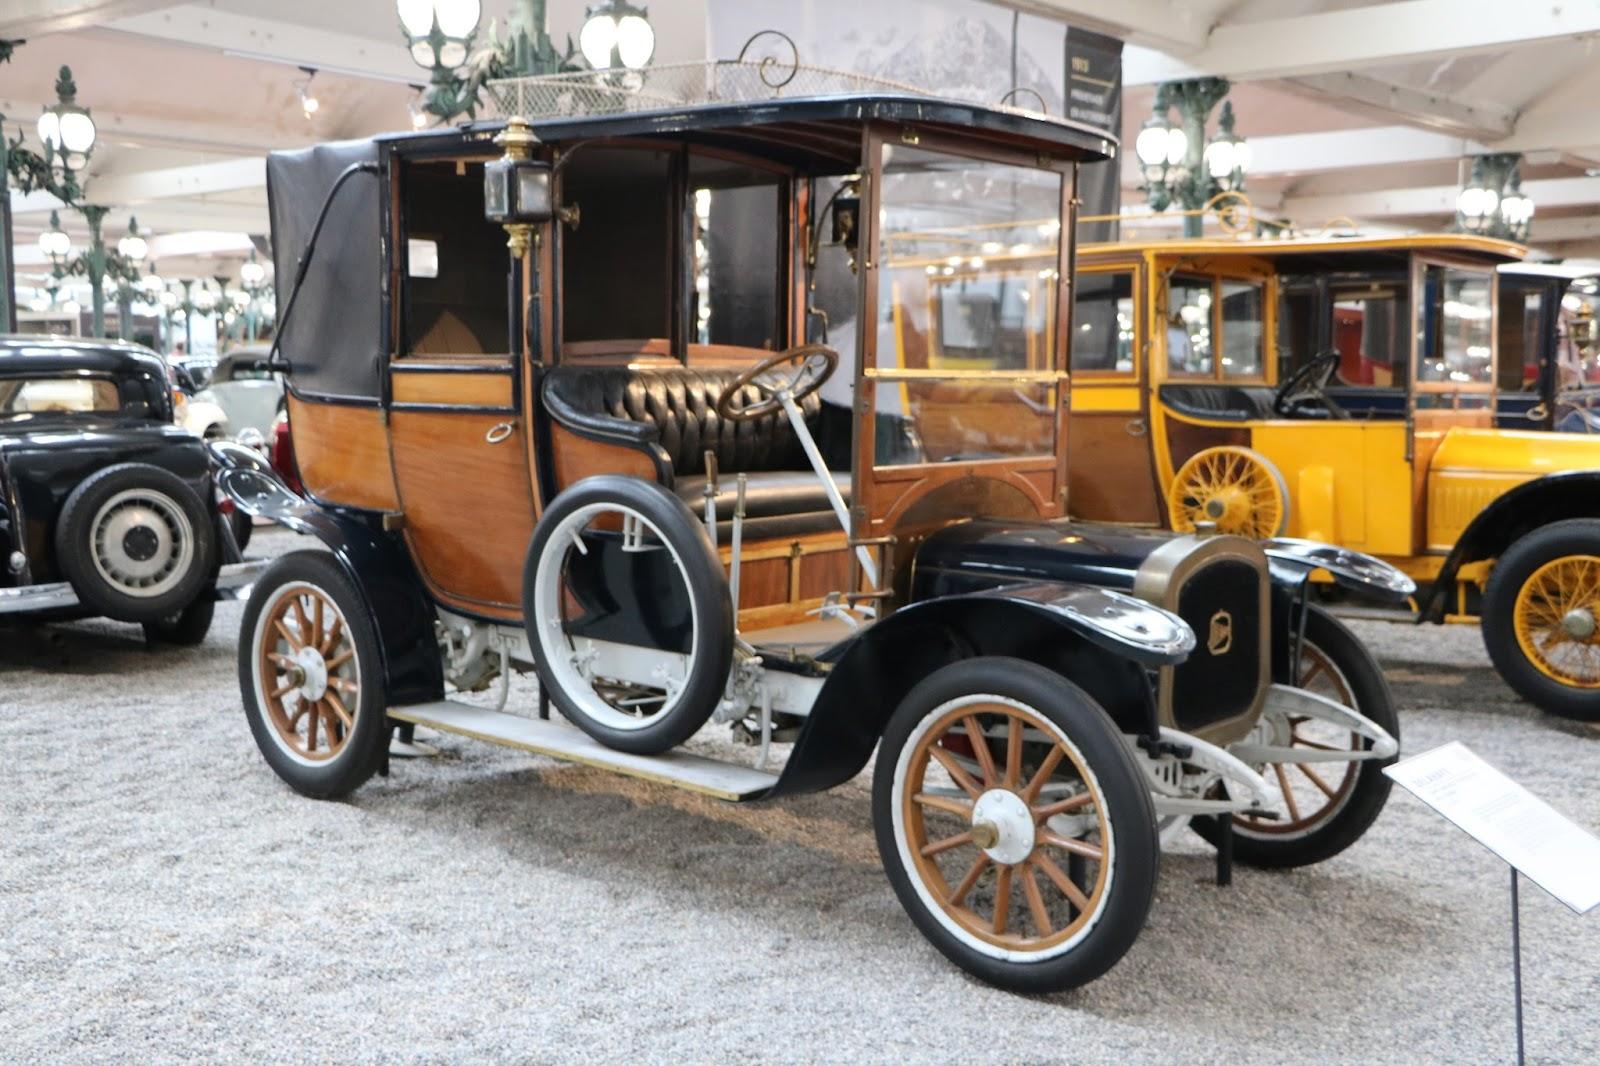 Schlumpf Collection 0651 - 1912 Delahaye Coupe Landaulet Type 10-12 HP.jpg